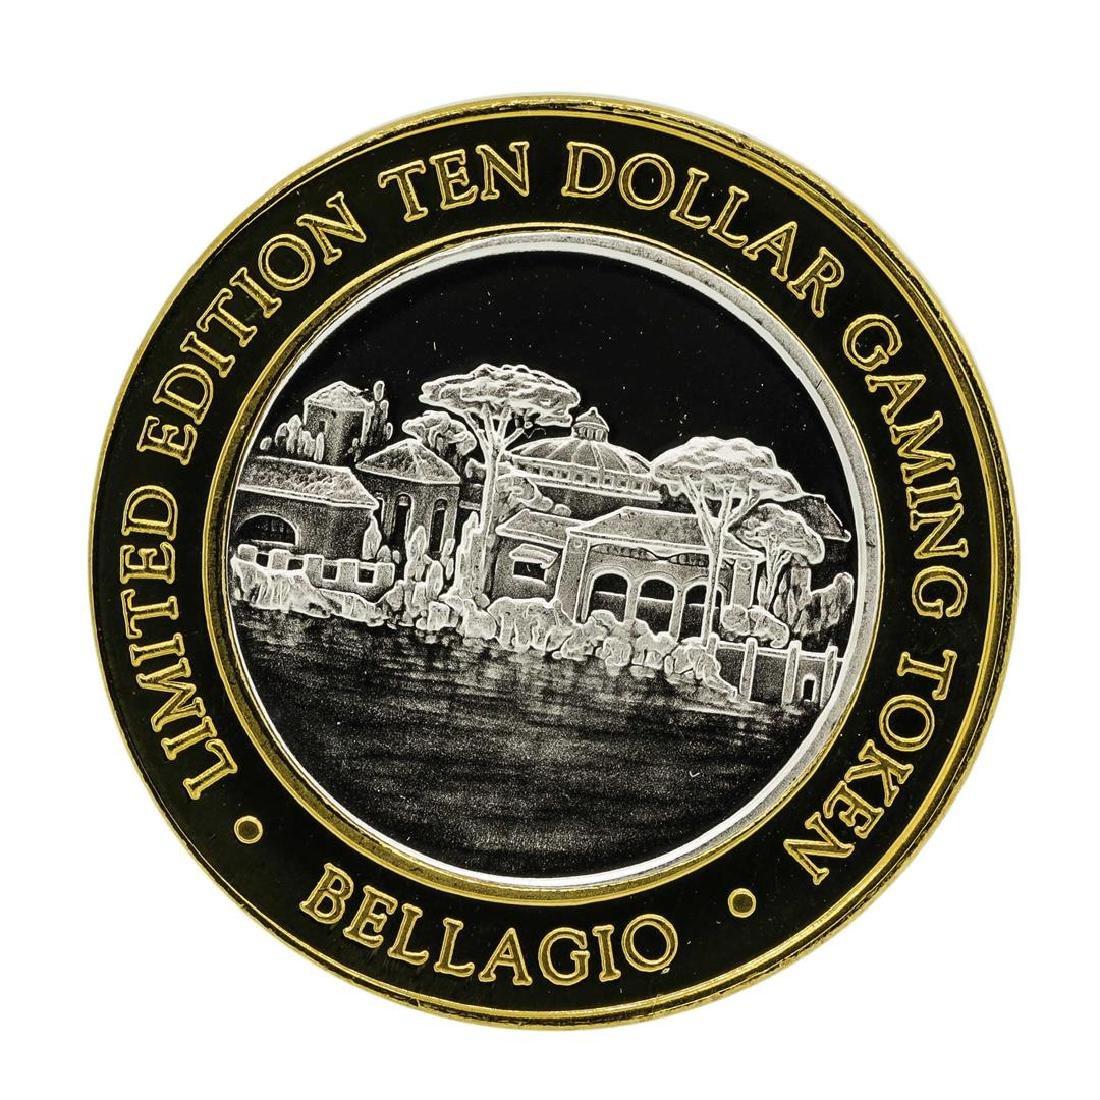 .999 Silver Bellagio Las Vegas, Nevada $10 Casino